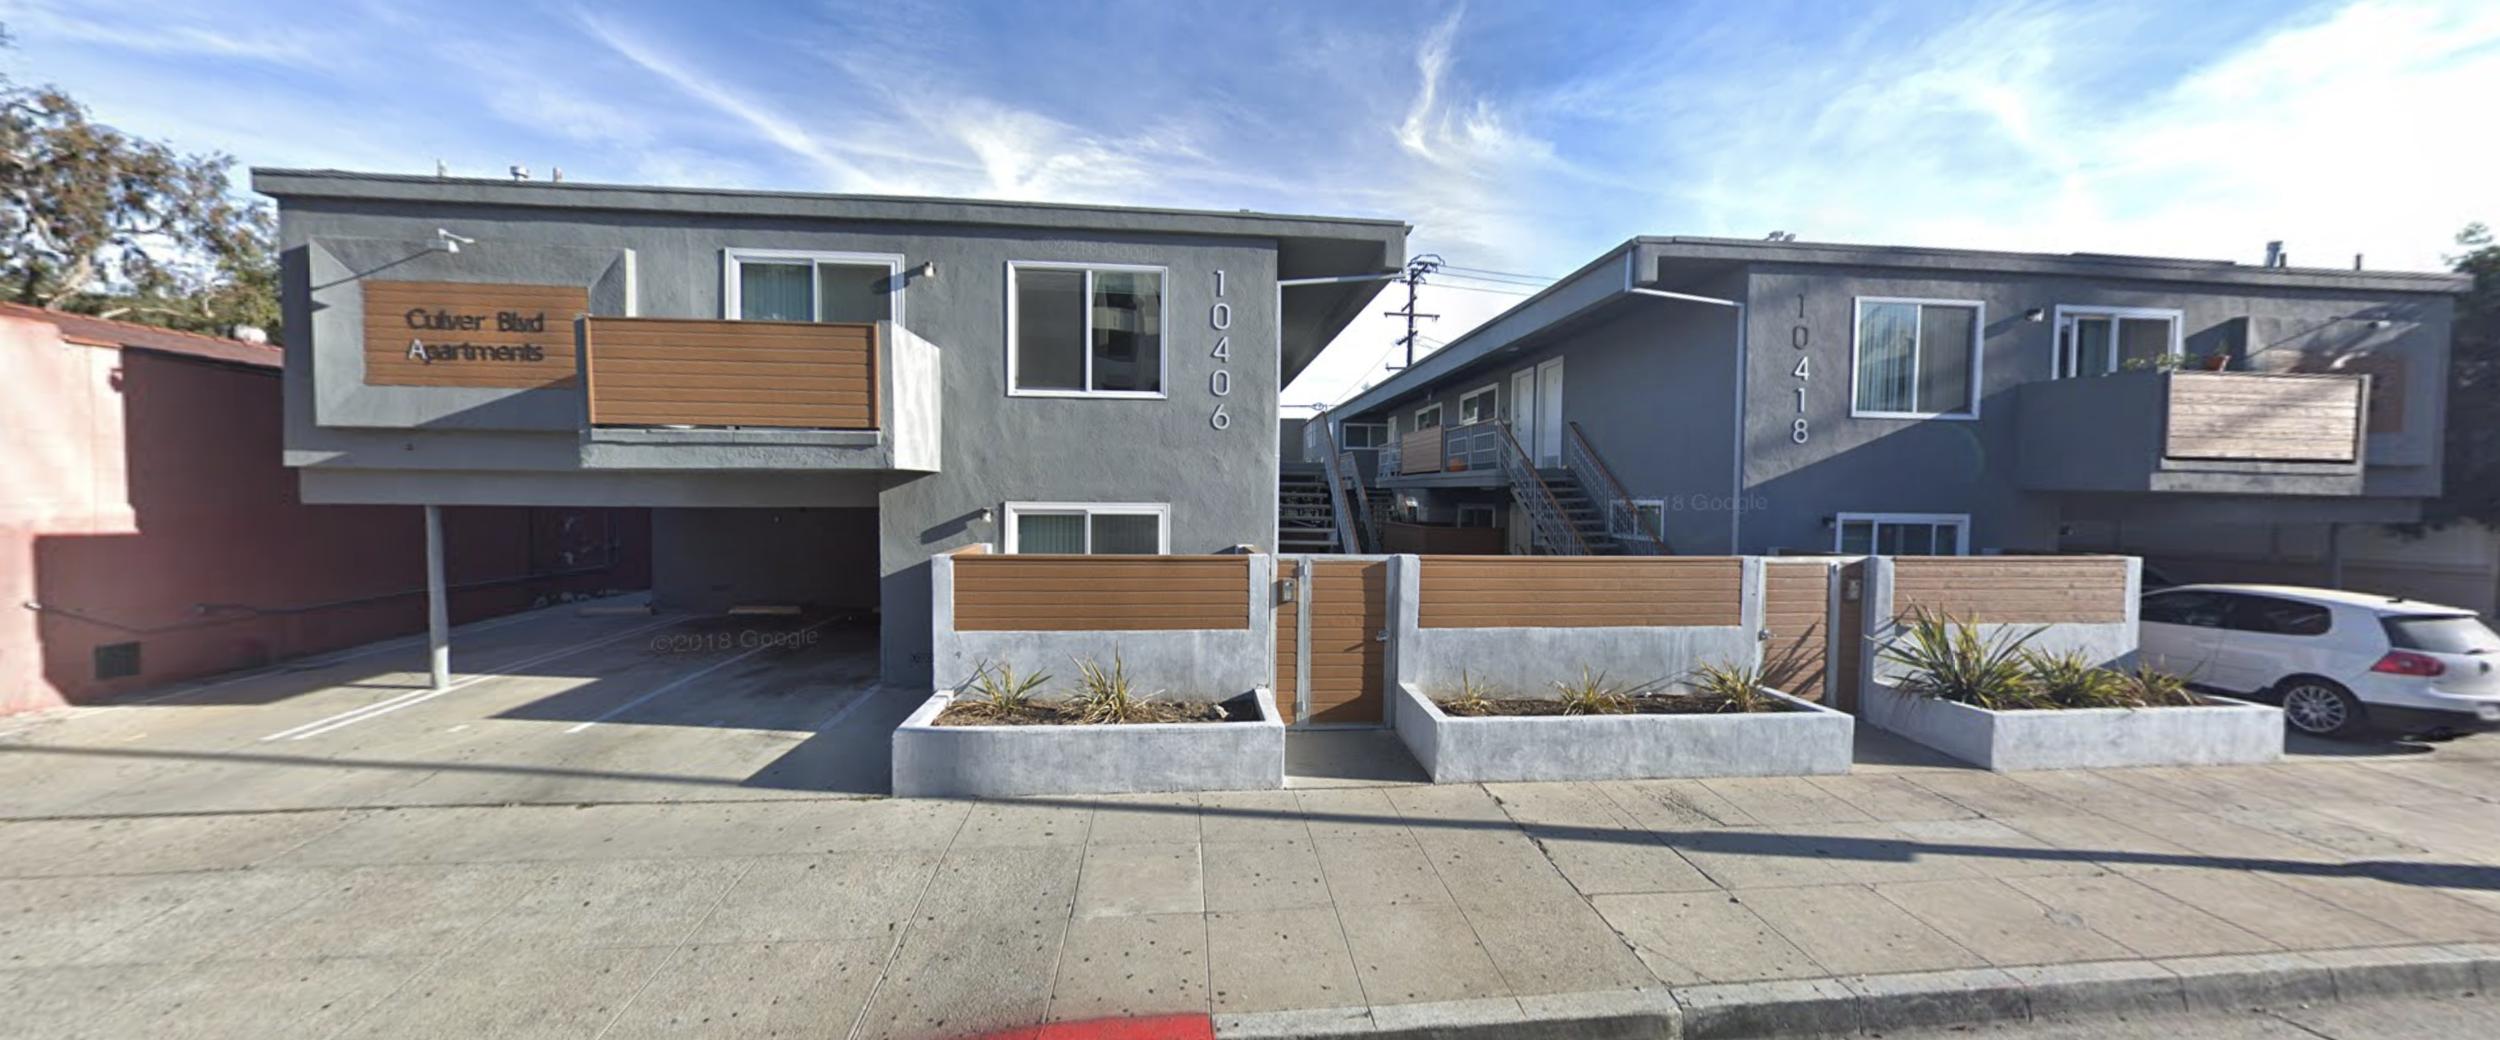 $4,075,000  Cash-Out Refinance  Culver City, CA